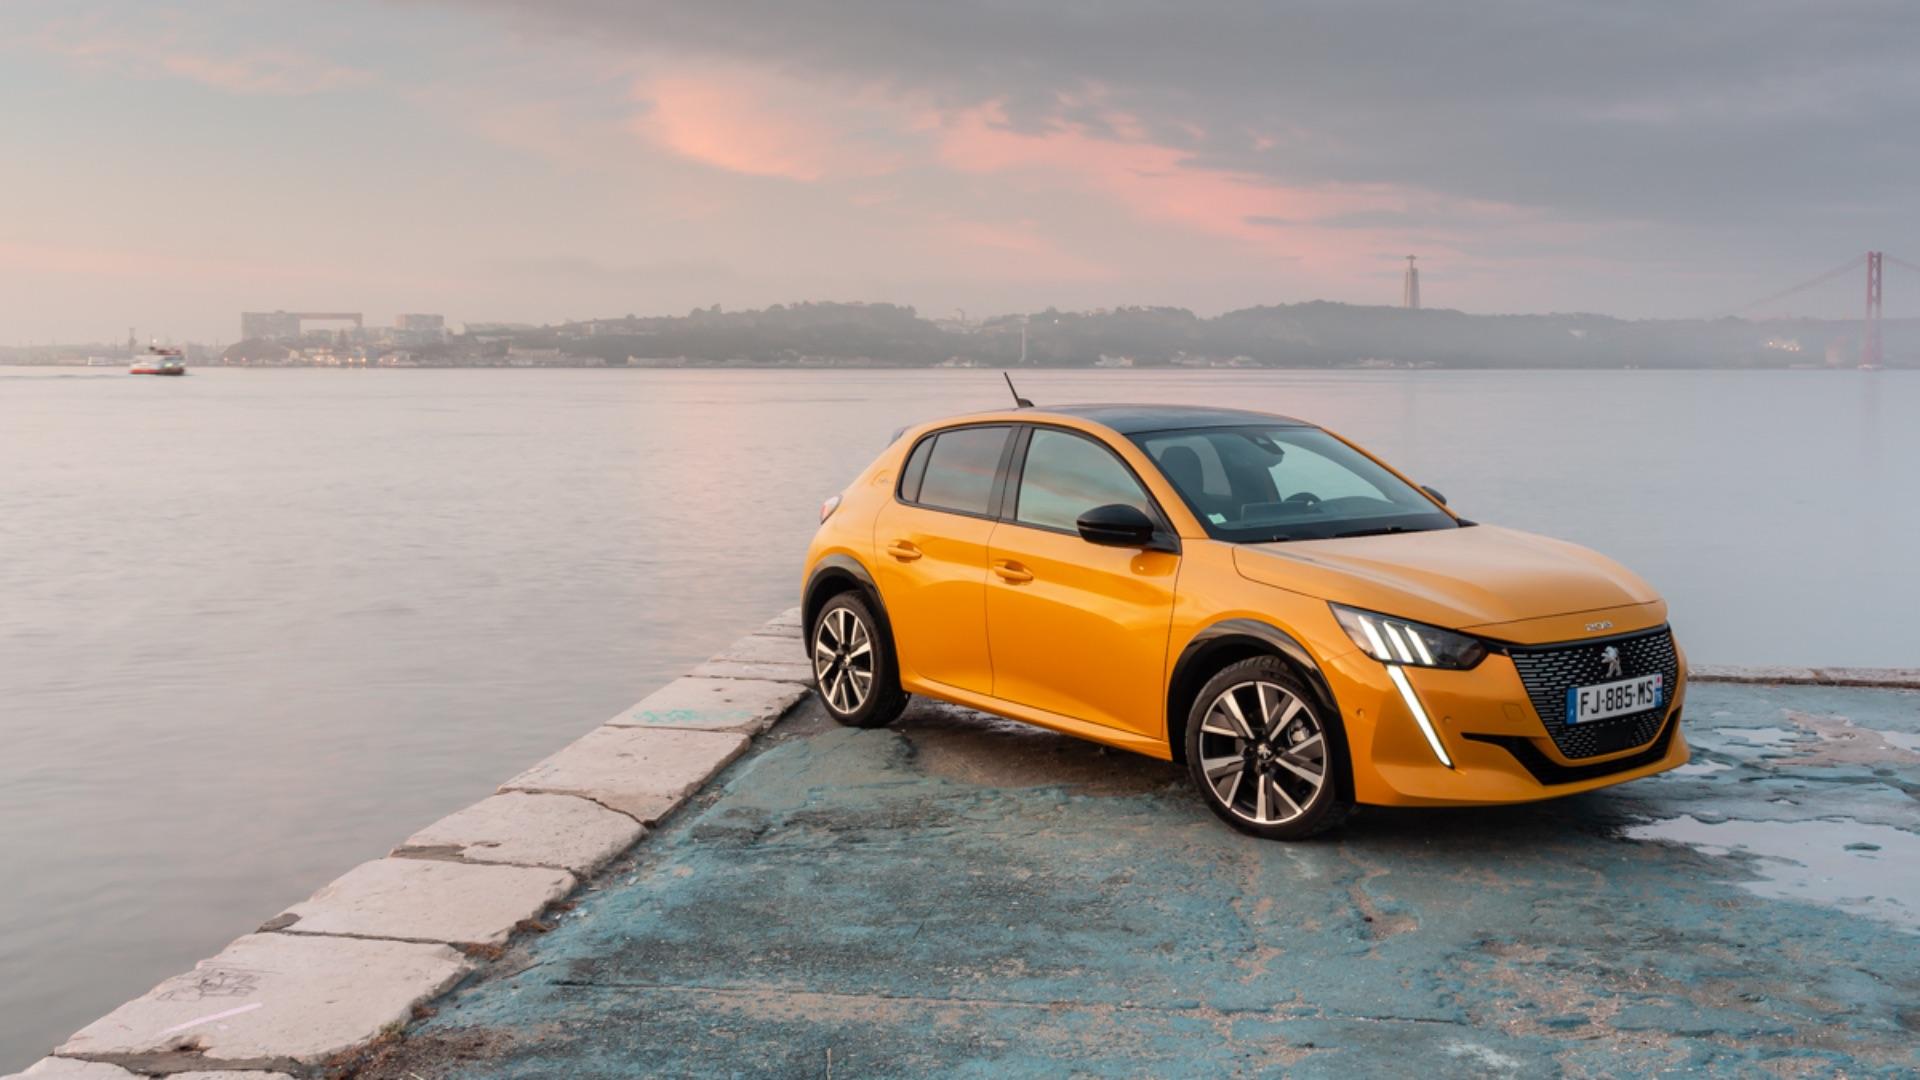 2020 Peugeot 208 review